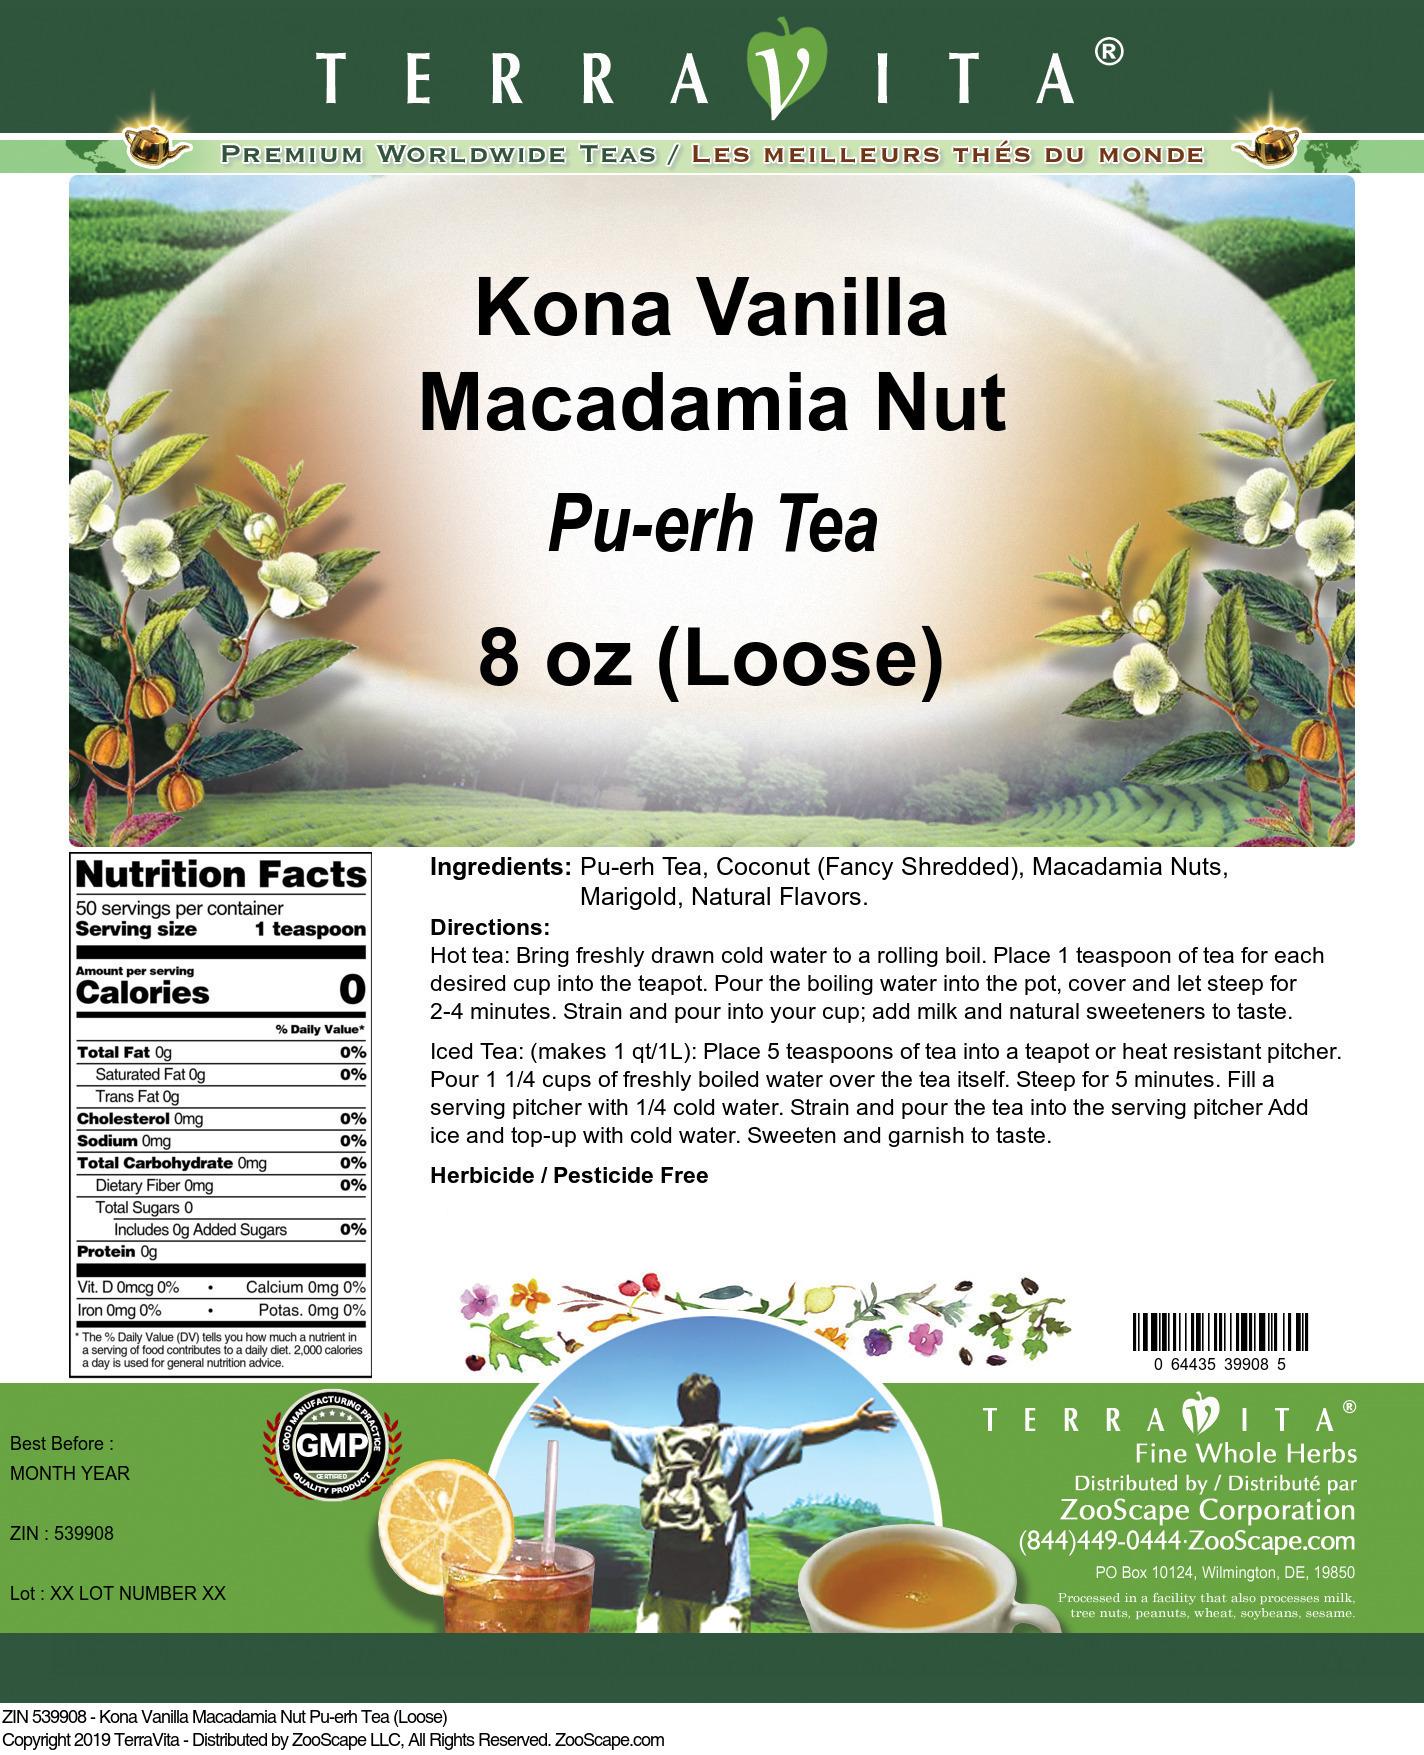 Kona Vanilla Macadamia Nut Pu-erh Tea